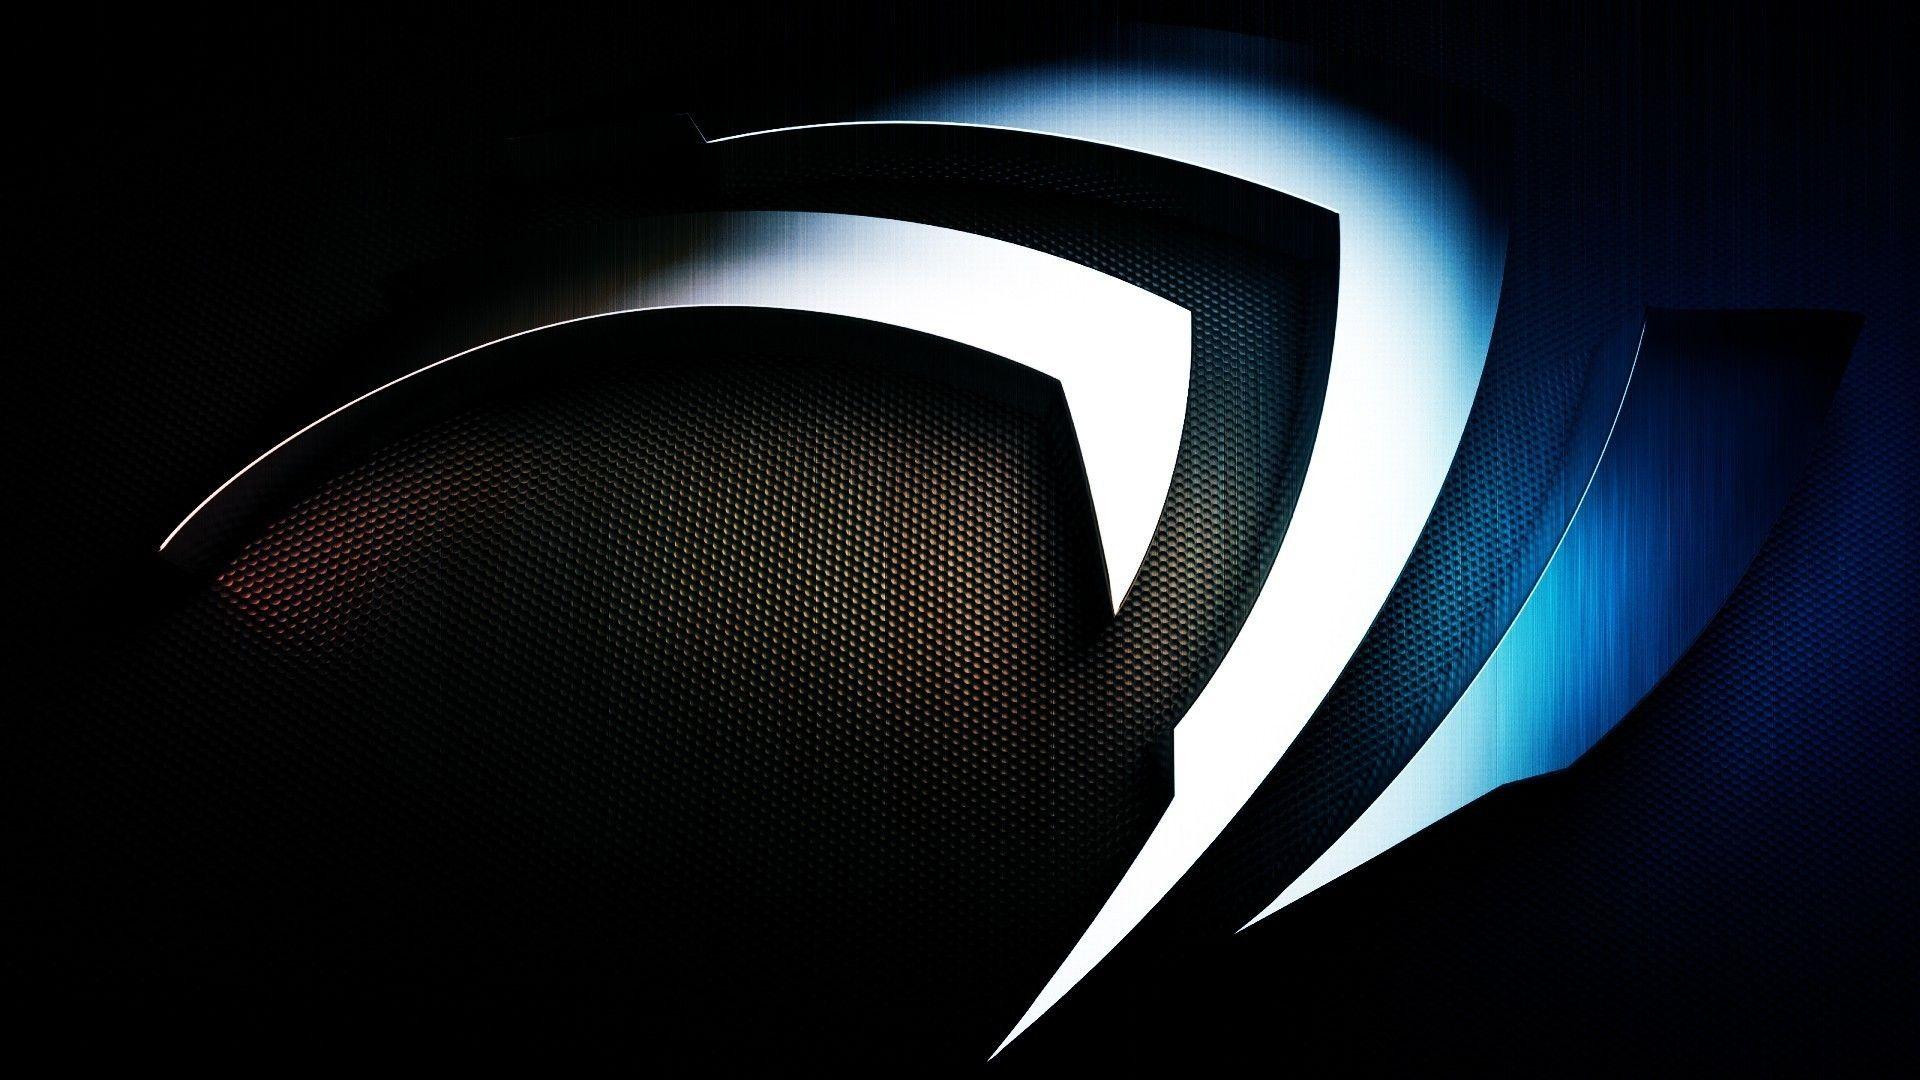 Logo Nvidia Wallpaper Gaming Wallpapers Uhd Wallpaper Hd Wallpapers 1080p